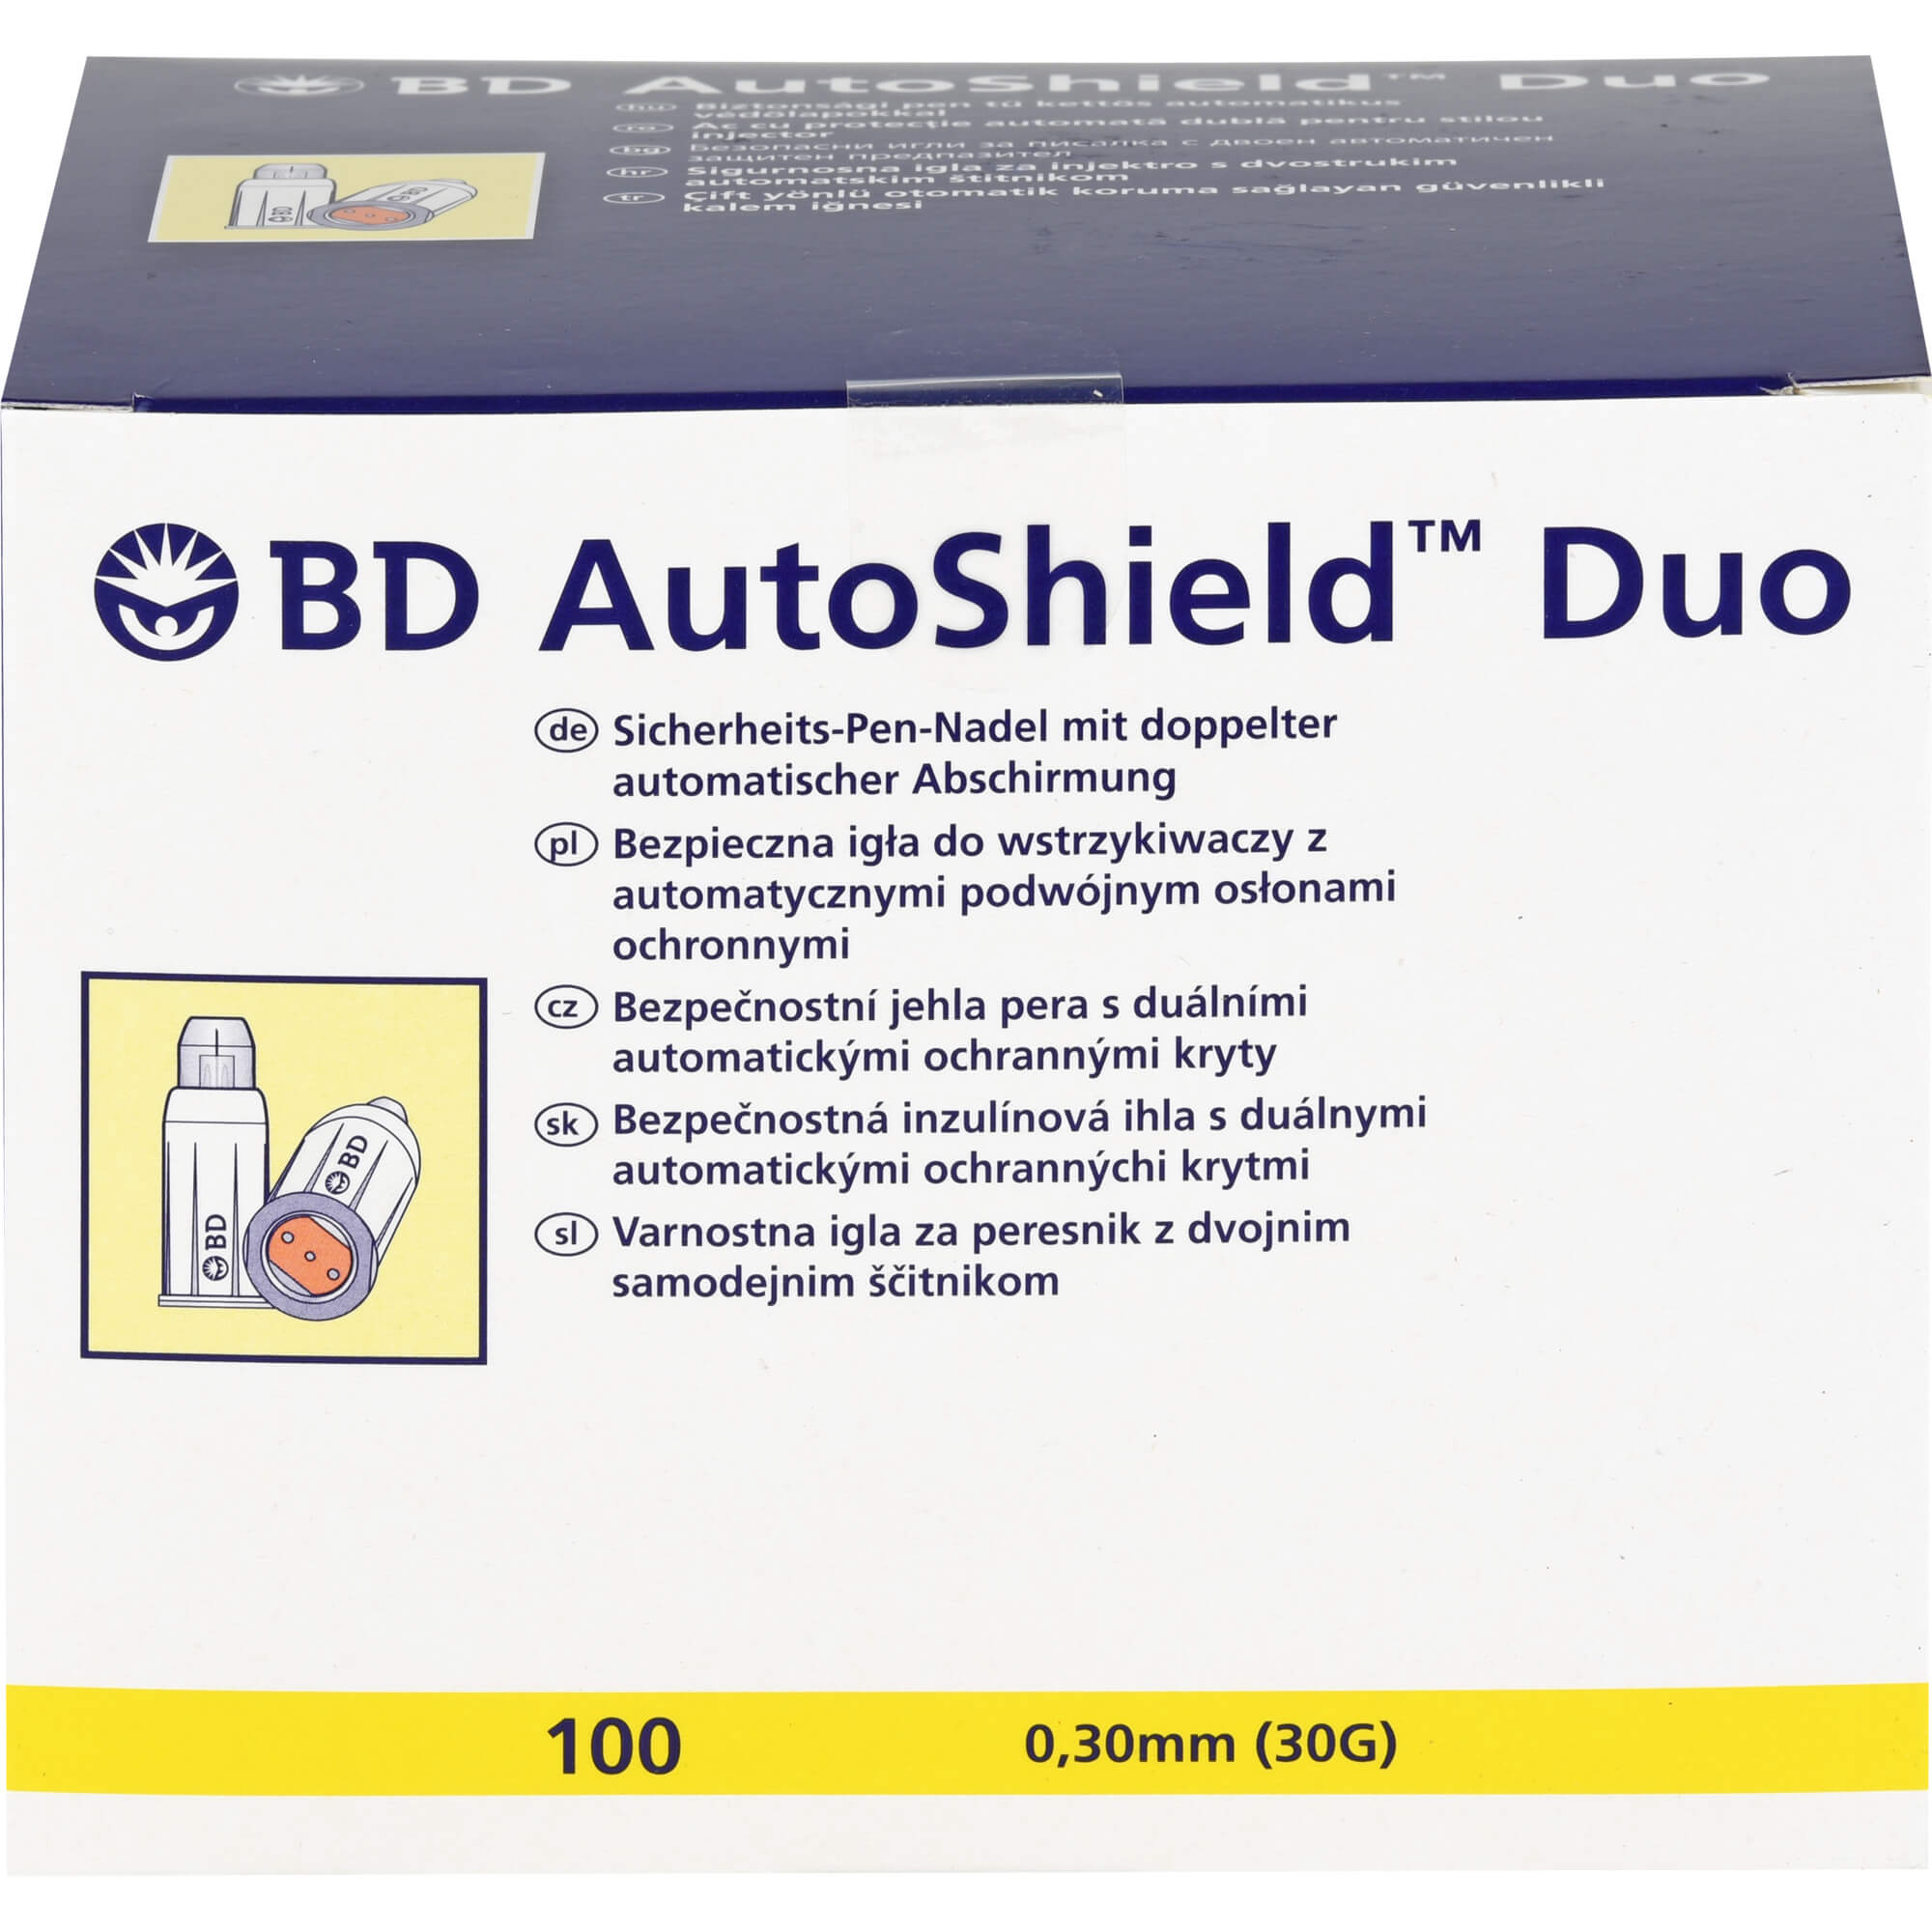 BD AUTOSHIELD Duo Sicherheits-Pen-Nadeln 5 mm